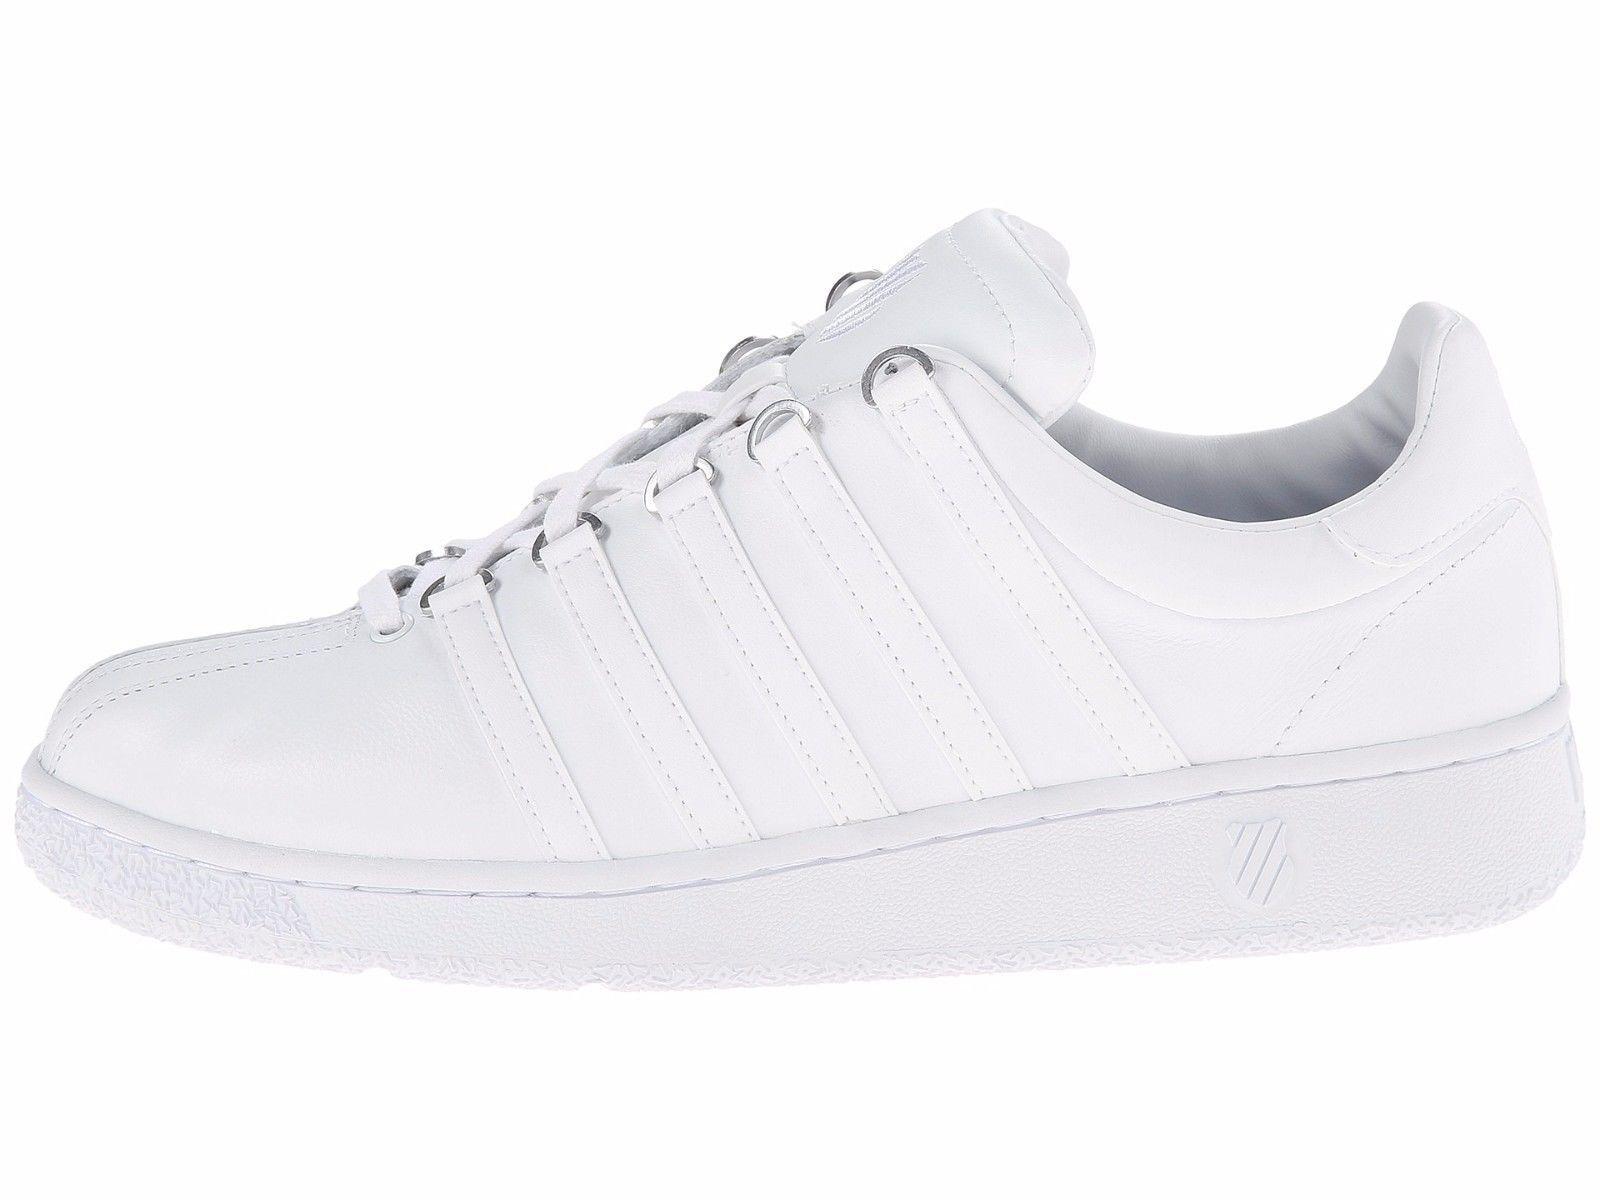 K-Swiss Classic VN White Men's Fashion Sneakers 03343-101